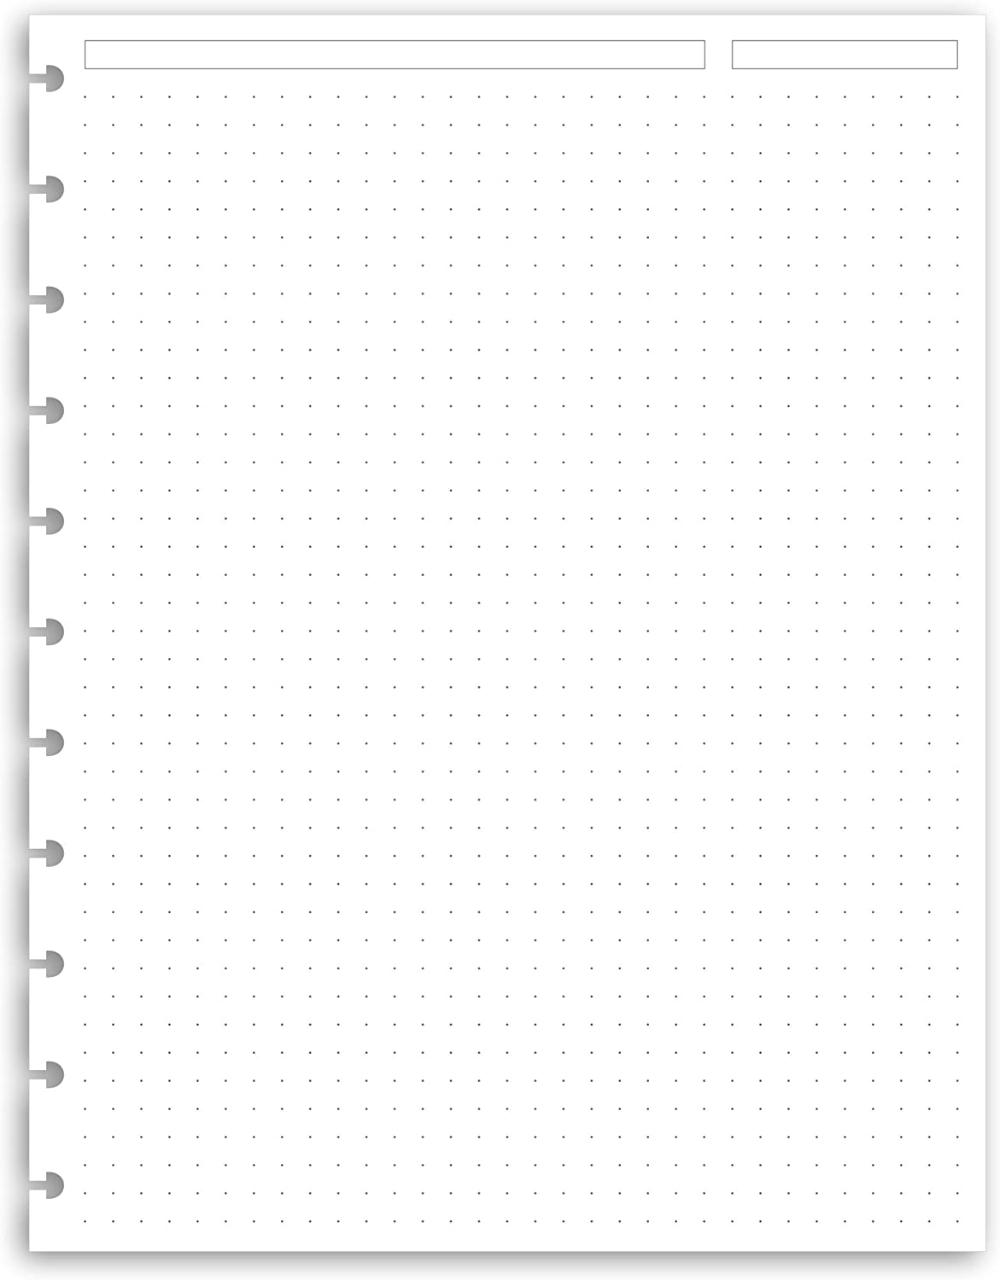 Amazon Com Eleven Discs Letter Ruled Sheets Premium Heavyweight Discbound Notebook Paper Refills Punched F In 2020 Grid Paper Notebook Paper Paper Background Design